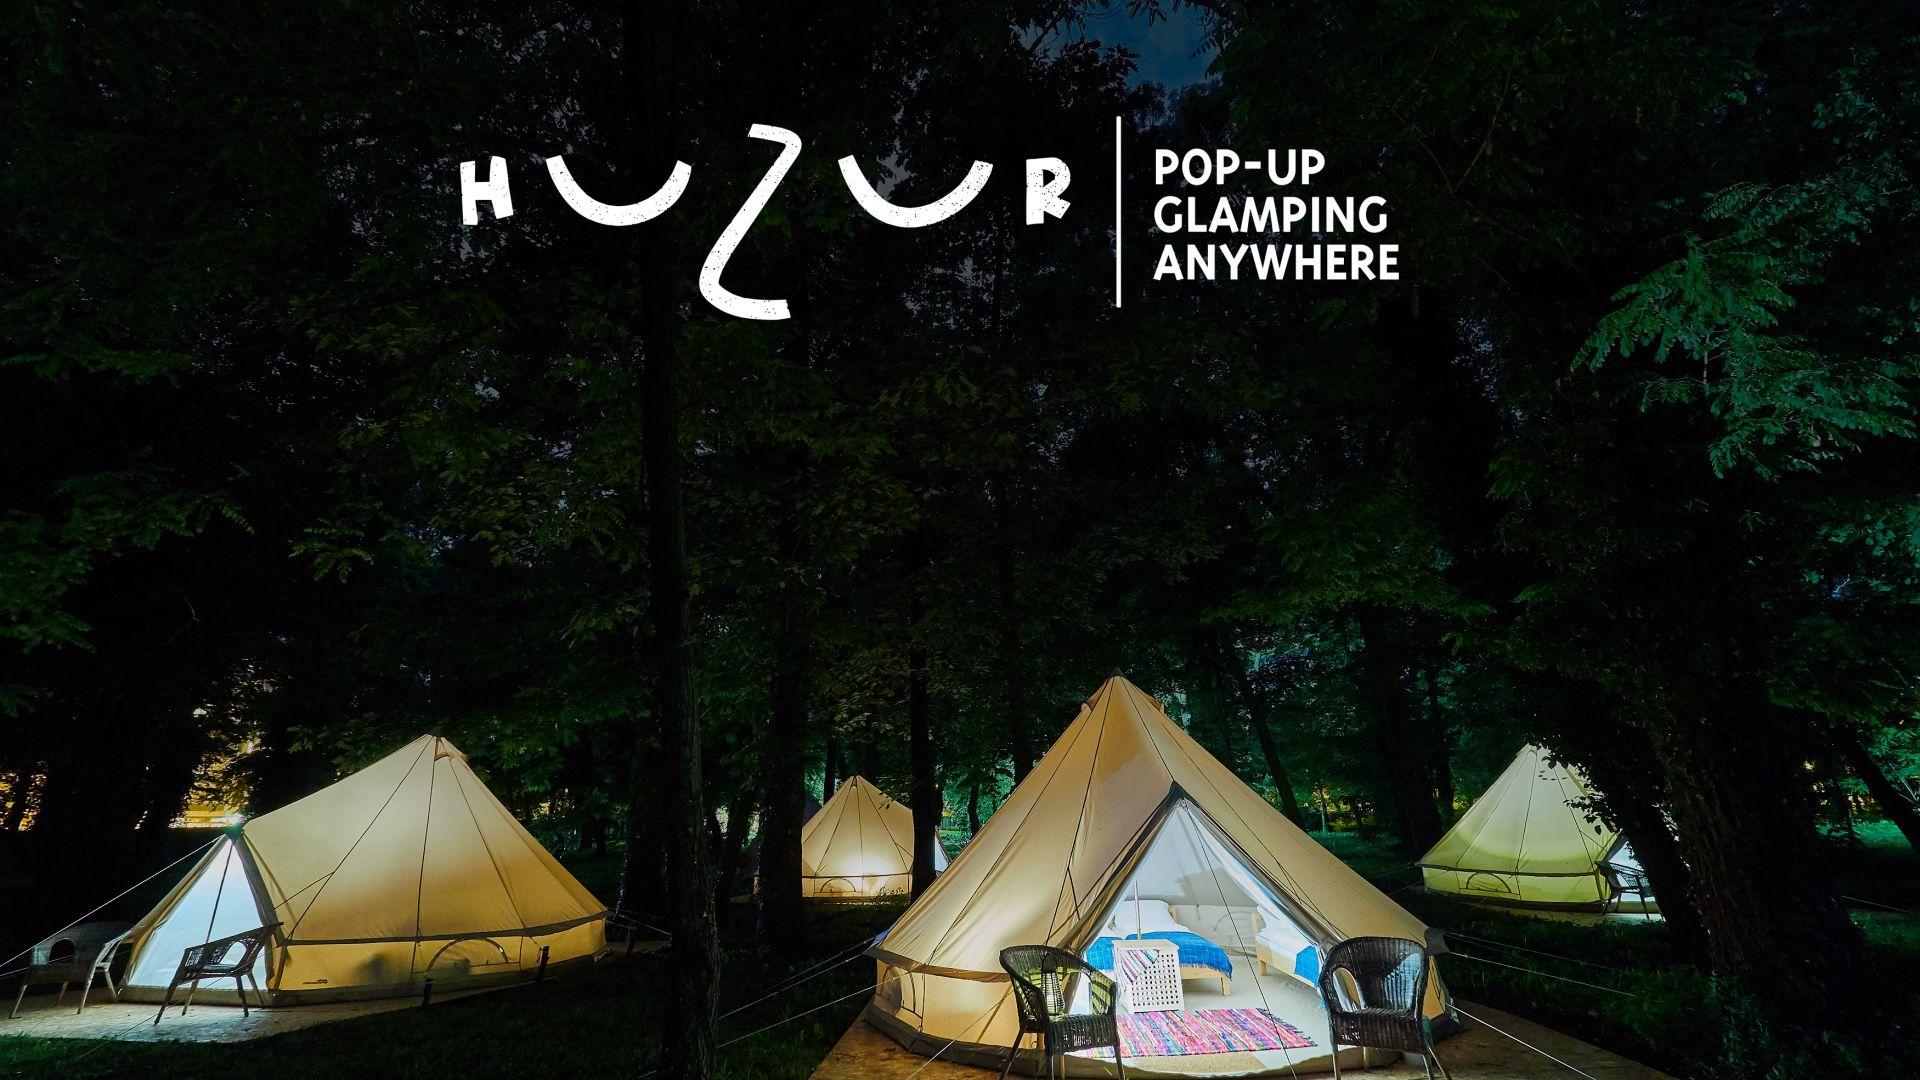 Huzur Glamping - Domeniul Stirbey Gallery